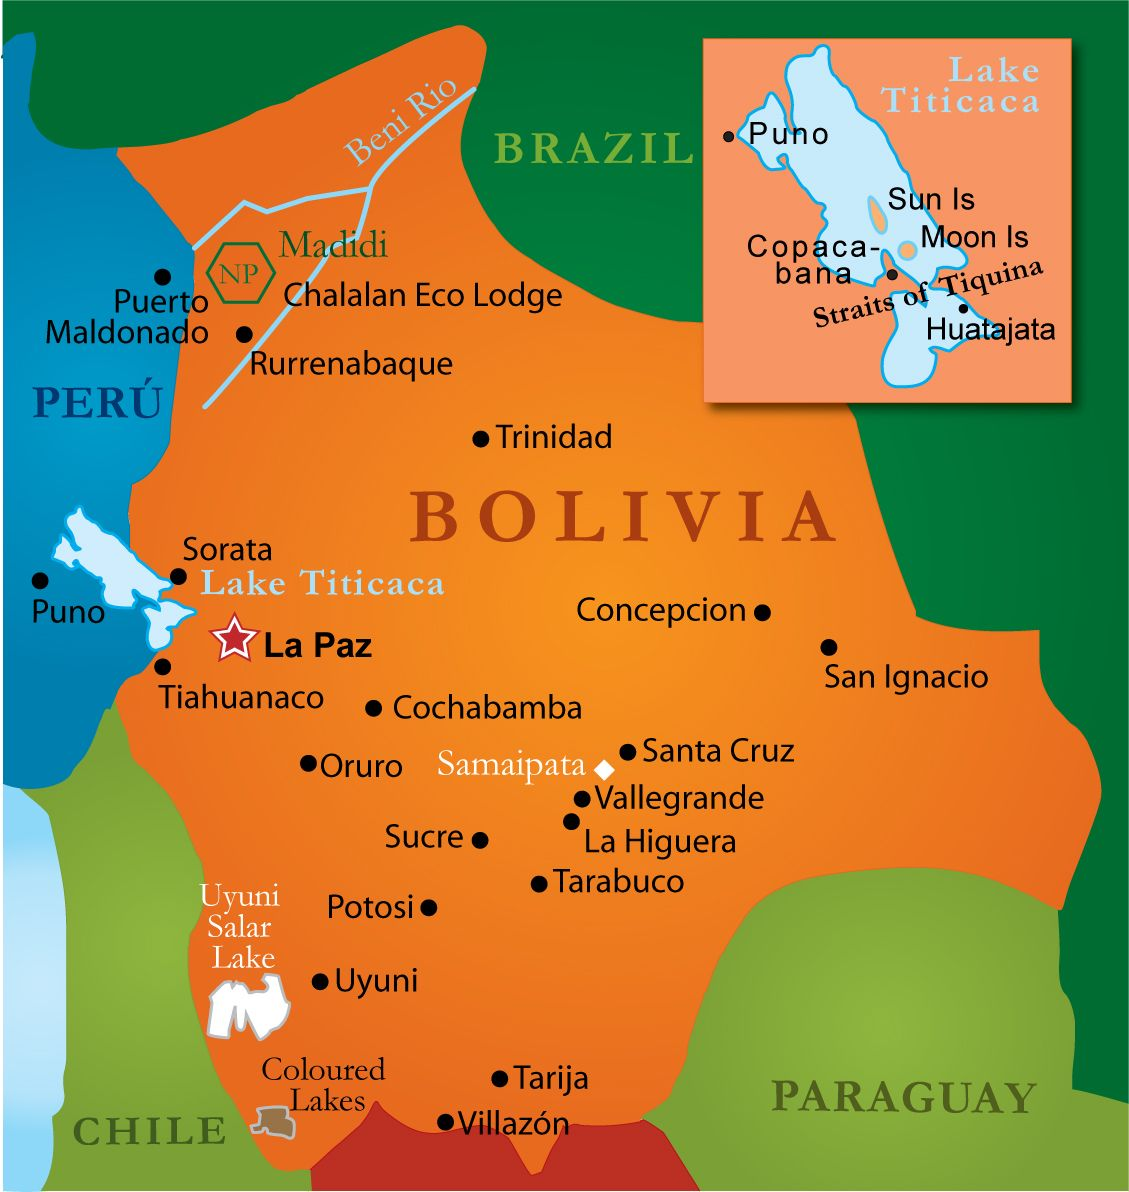 Tourist Map And Information Of Bolivia Tourismbolivia South - Map of bolivia